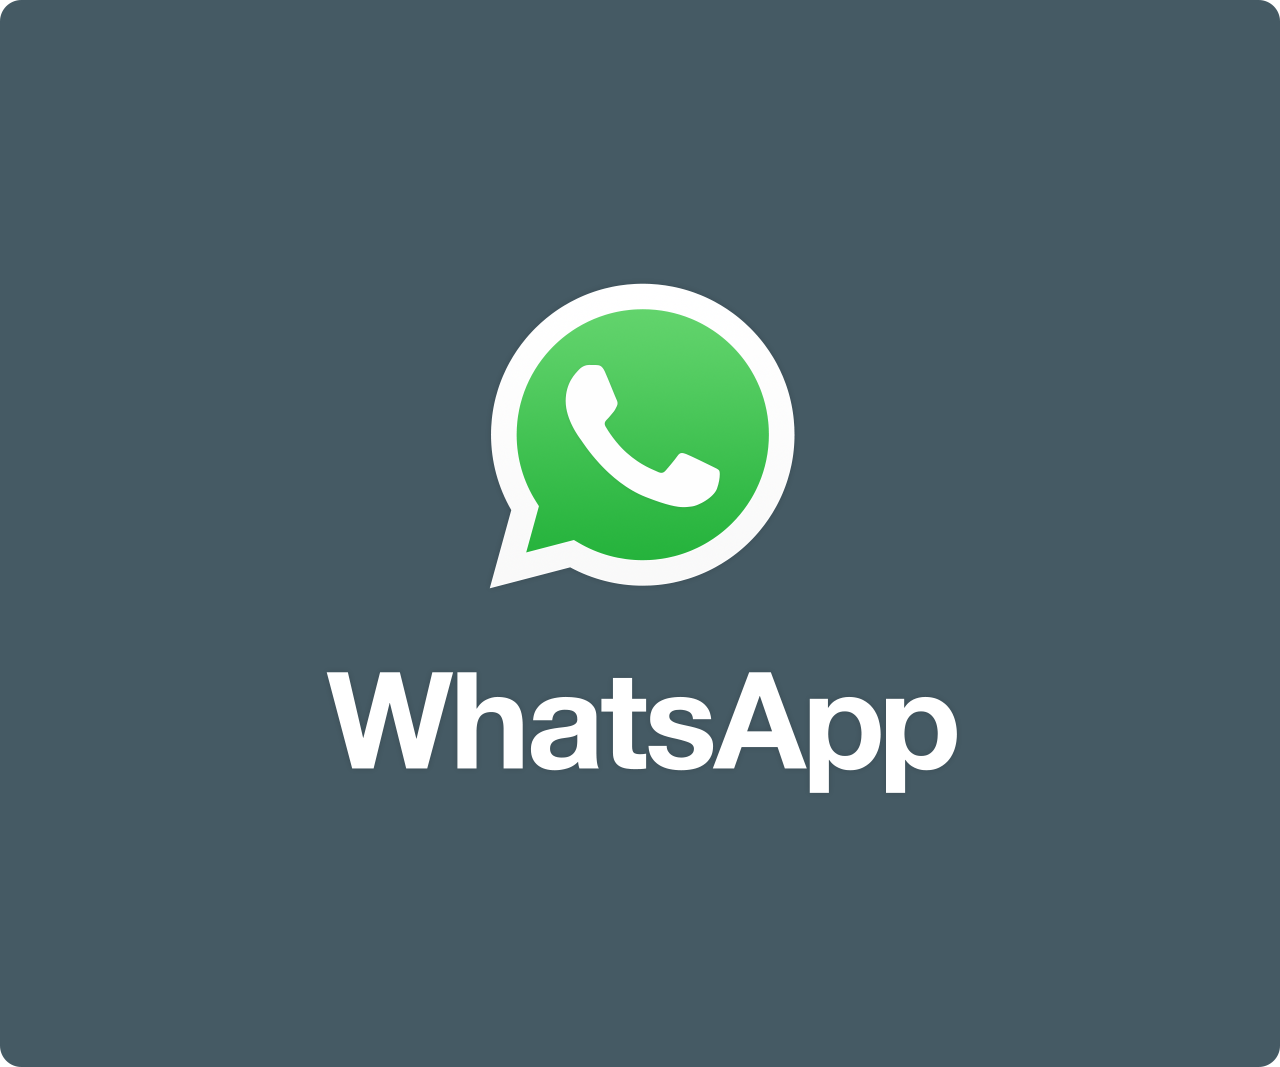 Neem contact met ons op via WhatsApp